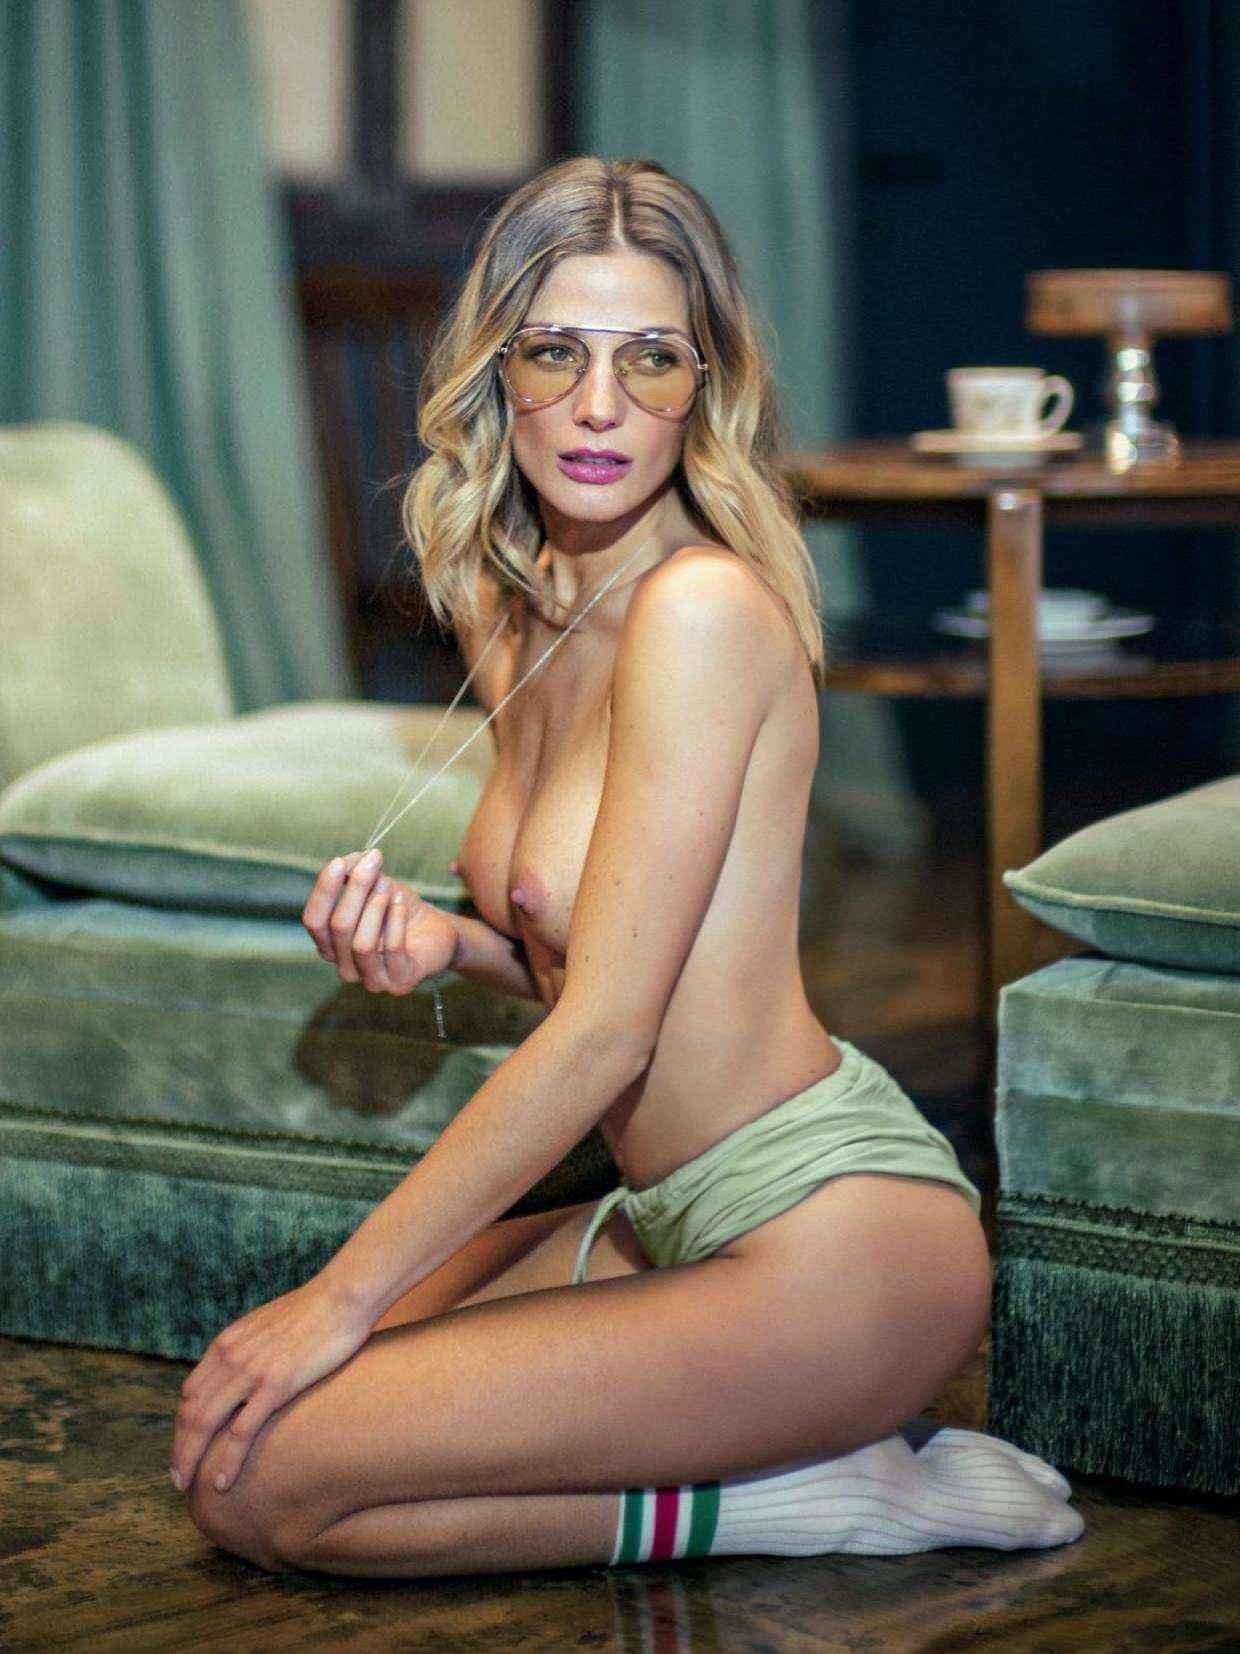 Porno Ana Moya Calzado naked (64 foto and video), Sexy, Bikini, Twitter, underwear 2006